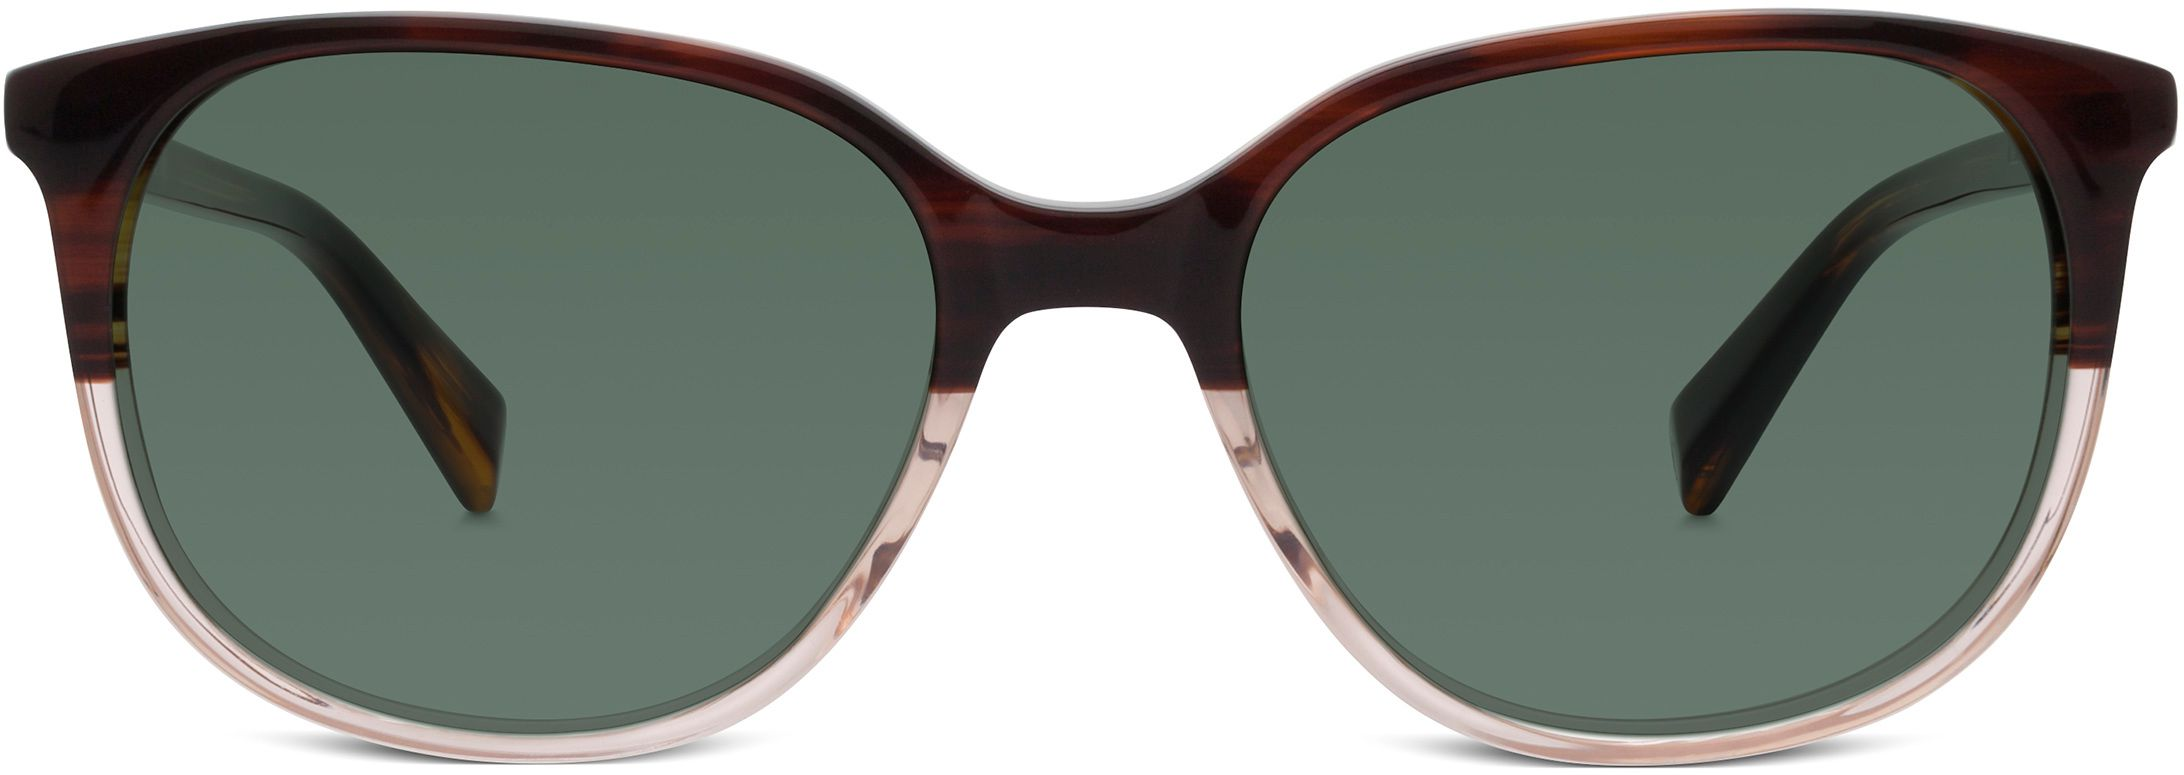 f33859e96fe Laurel Sunglasses in Tea Rose Fade with Green Grey lenses for Women ...